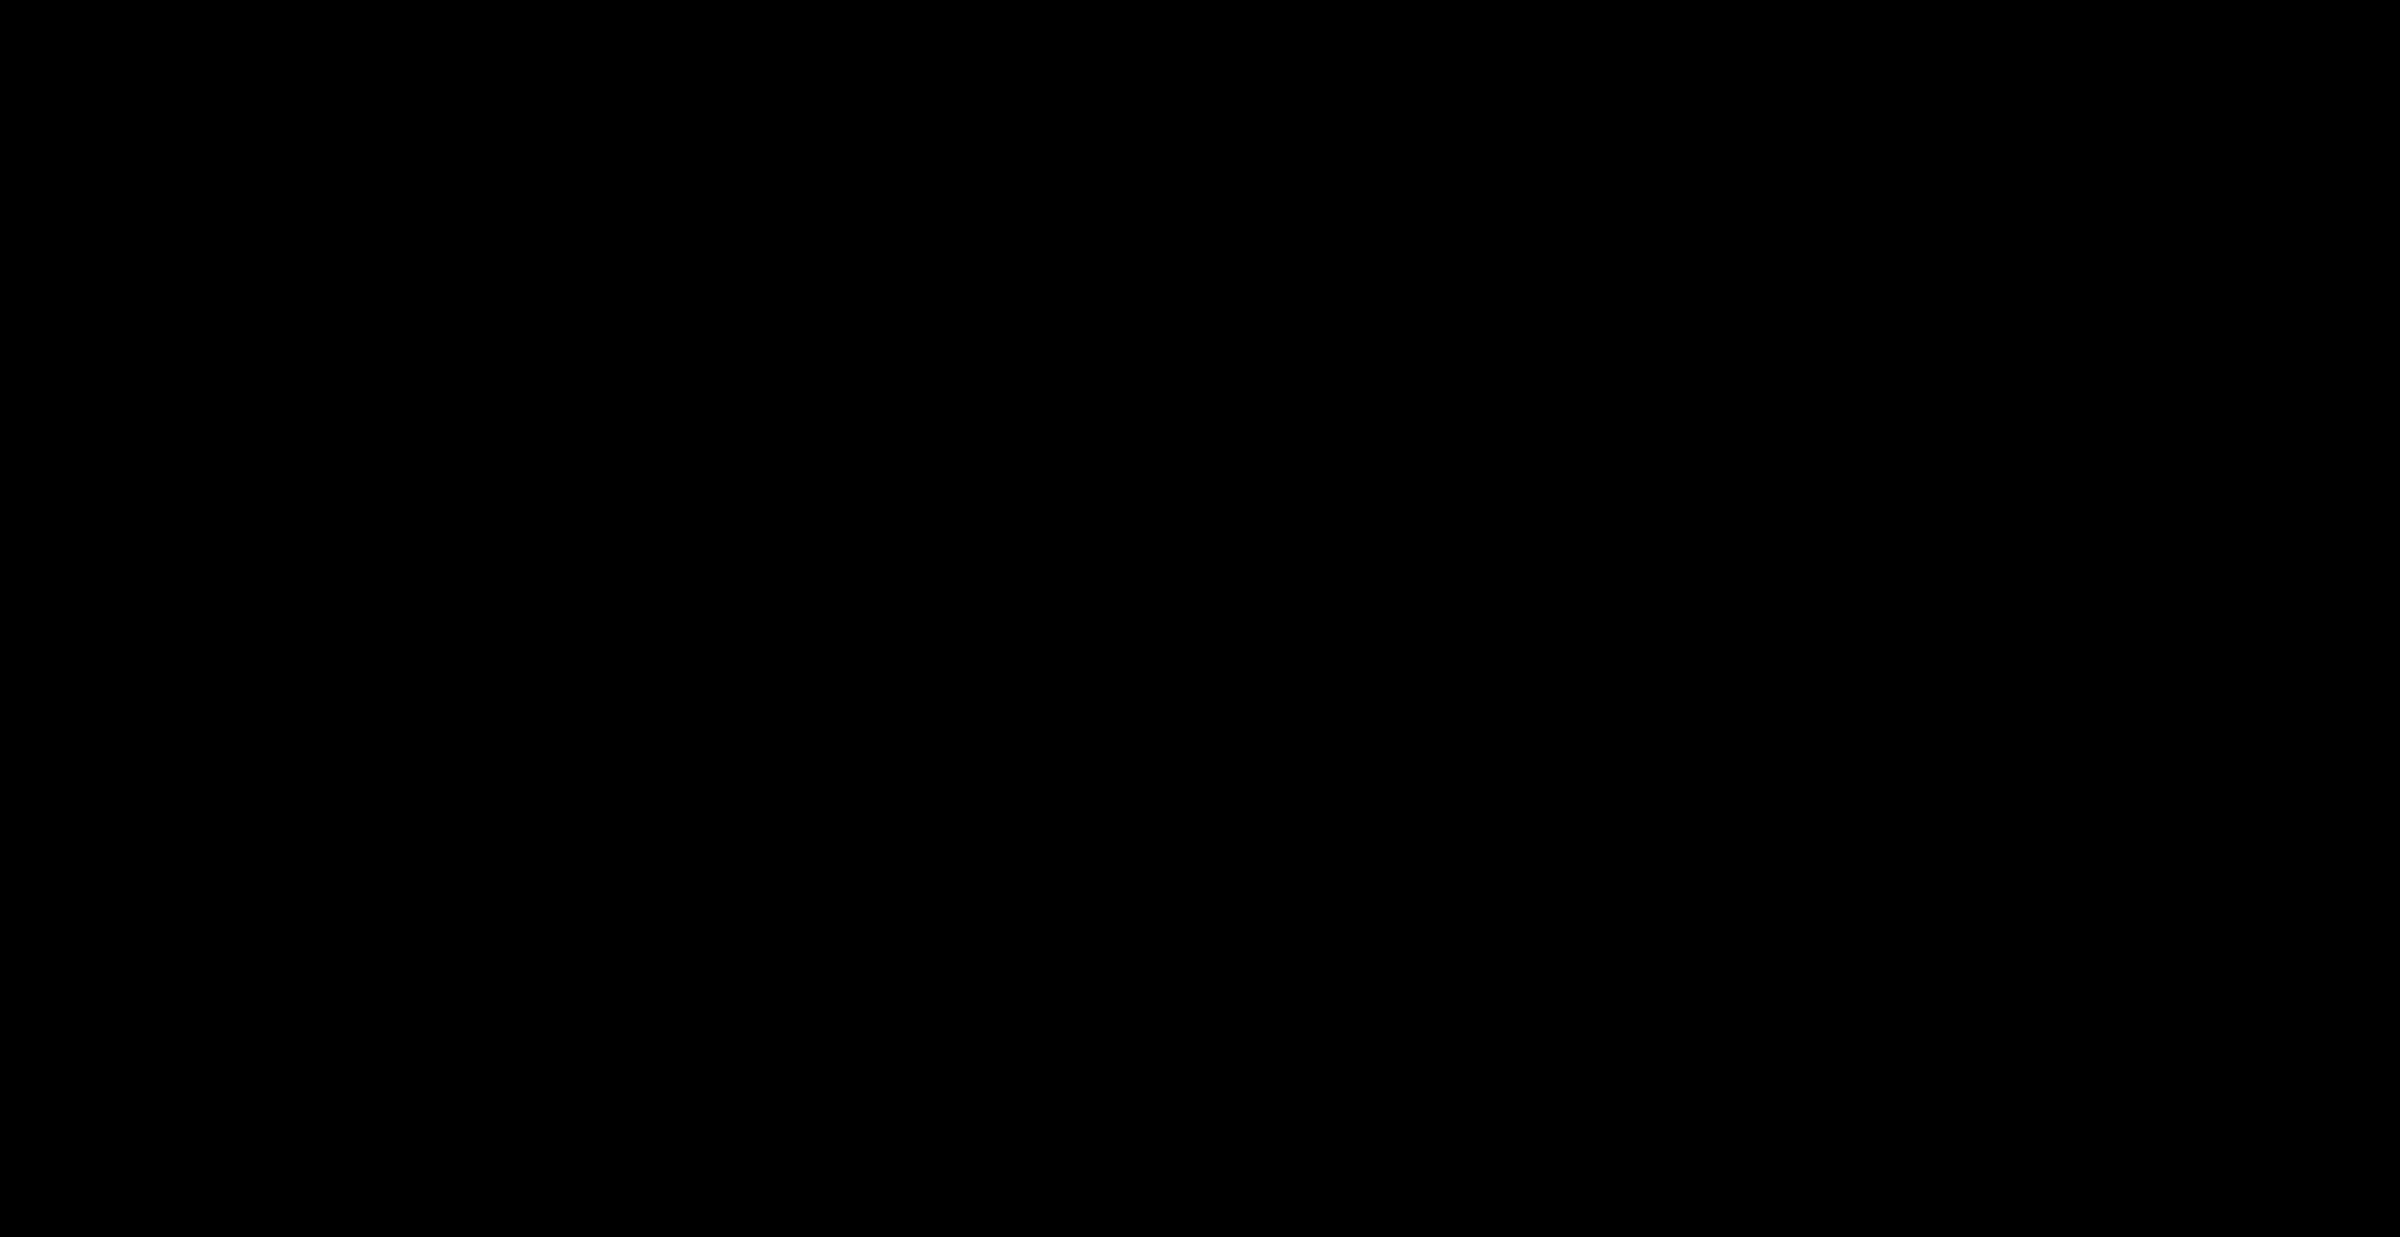 2400x1237 Silhouette